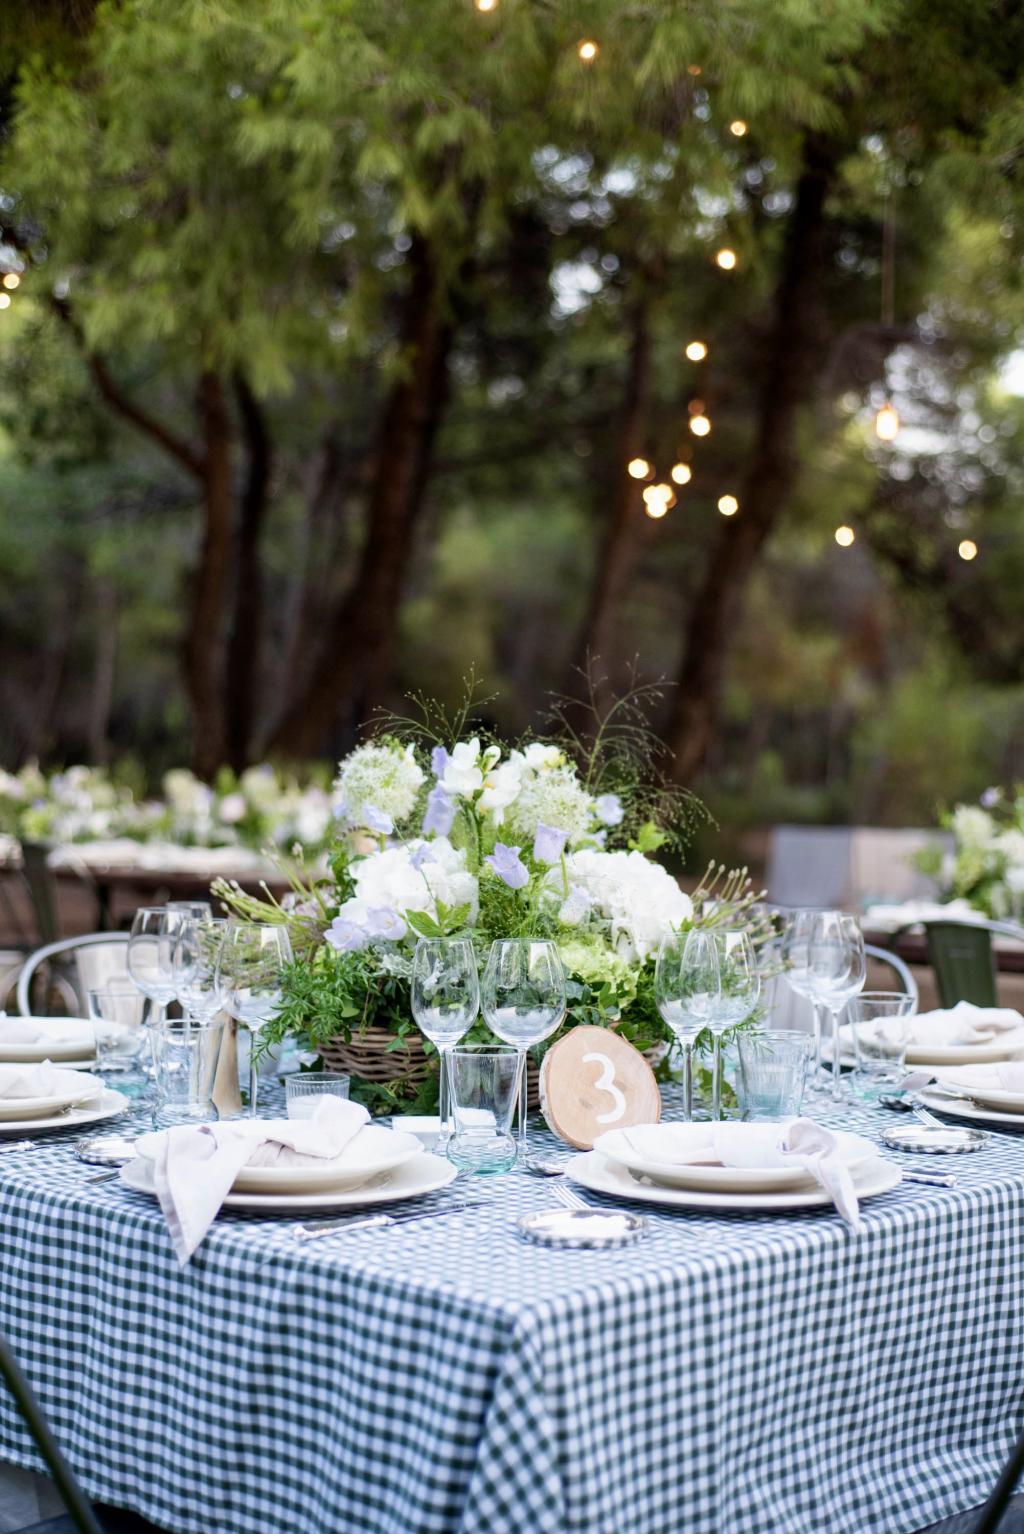 PE&N Sinterina wedding - Image 8